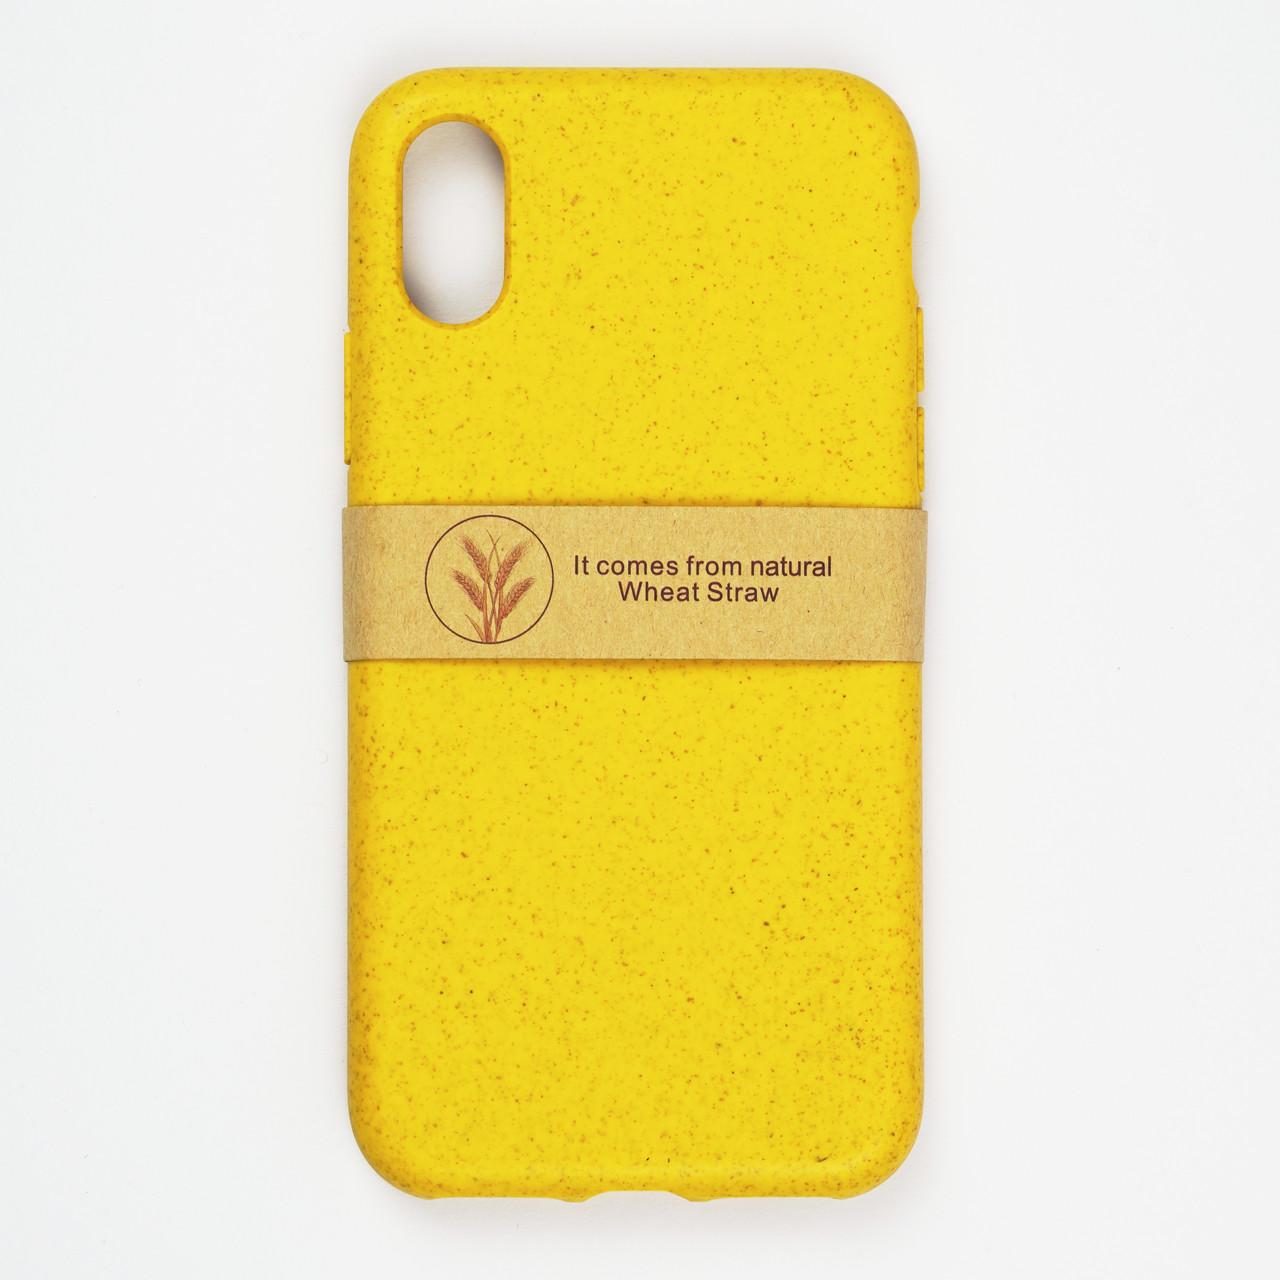 Биоразлагаемый чехол ECO Wheat Straw для iPhone XR Yellow